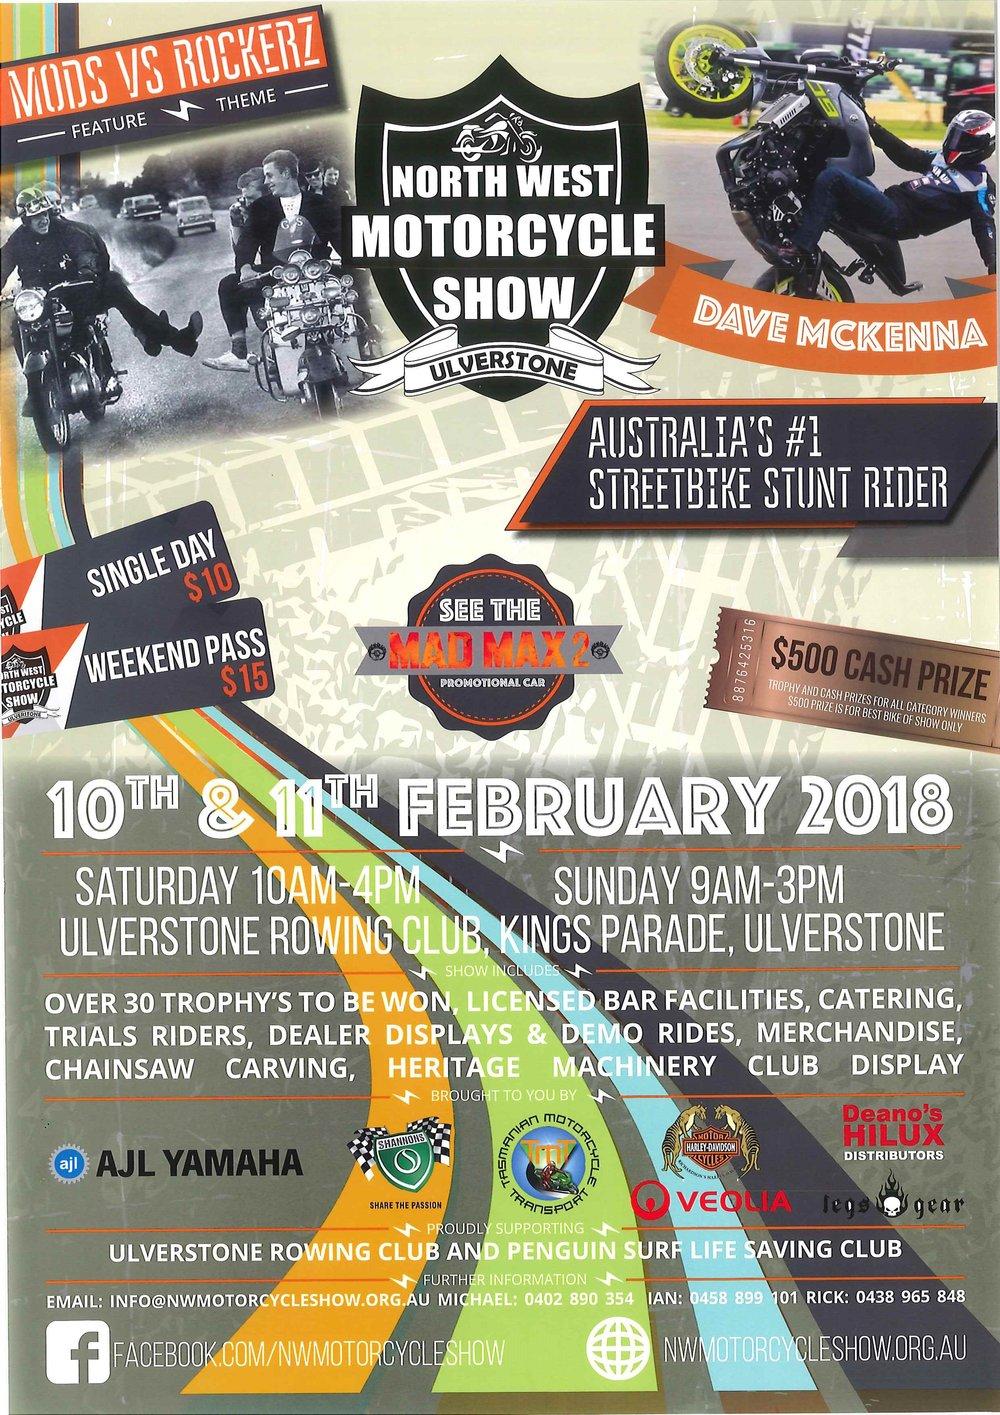 NW Motocycle Show.jpg